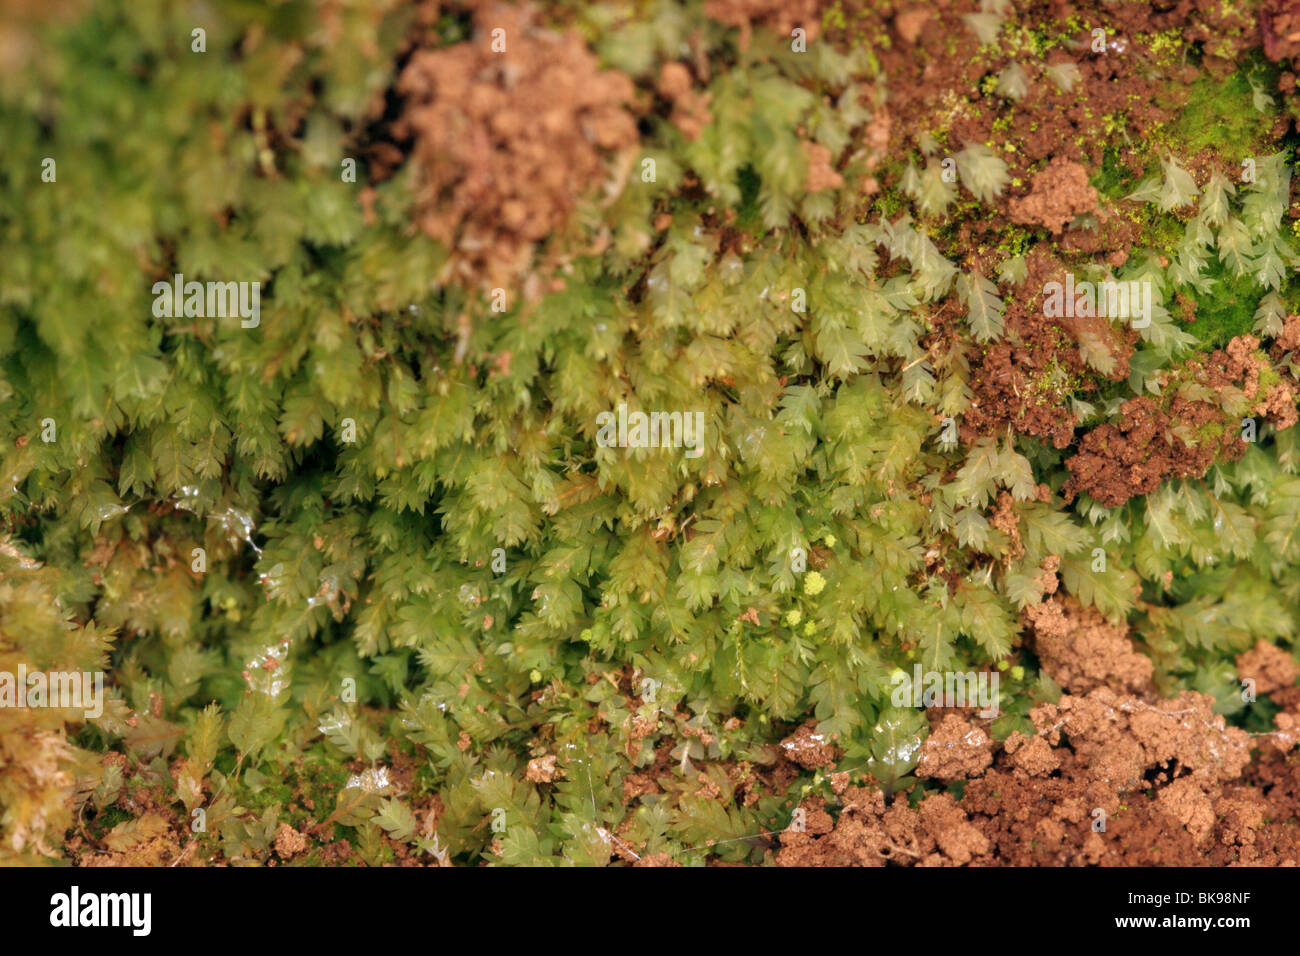 Luminous moss (Schistostega pennata) in a rabbit burrow, UK. - Stock Image